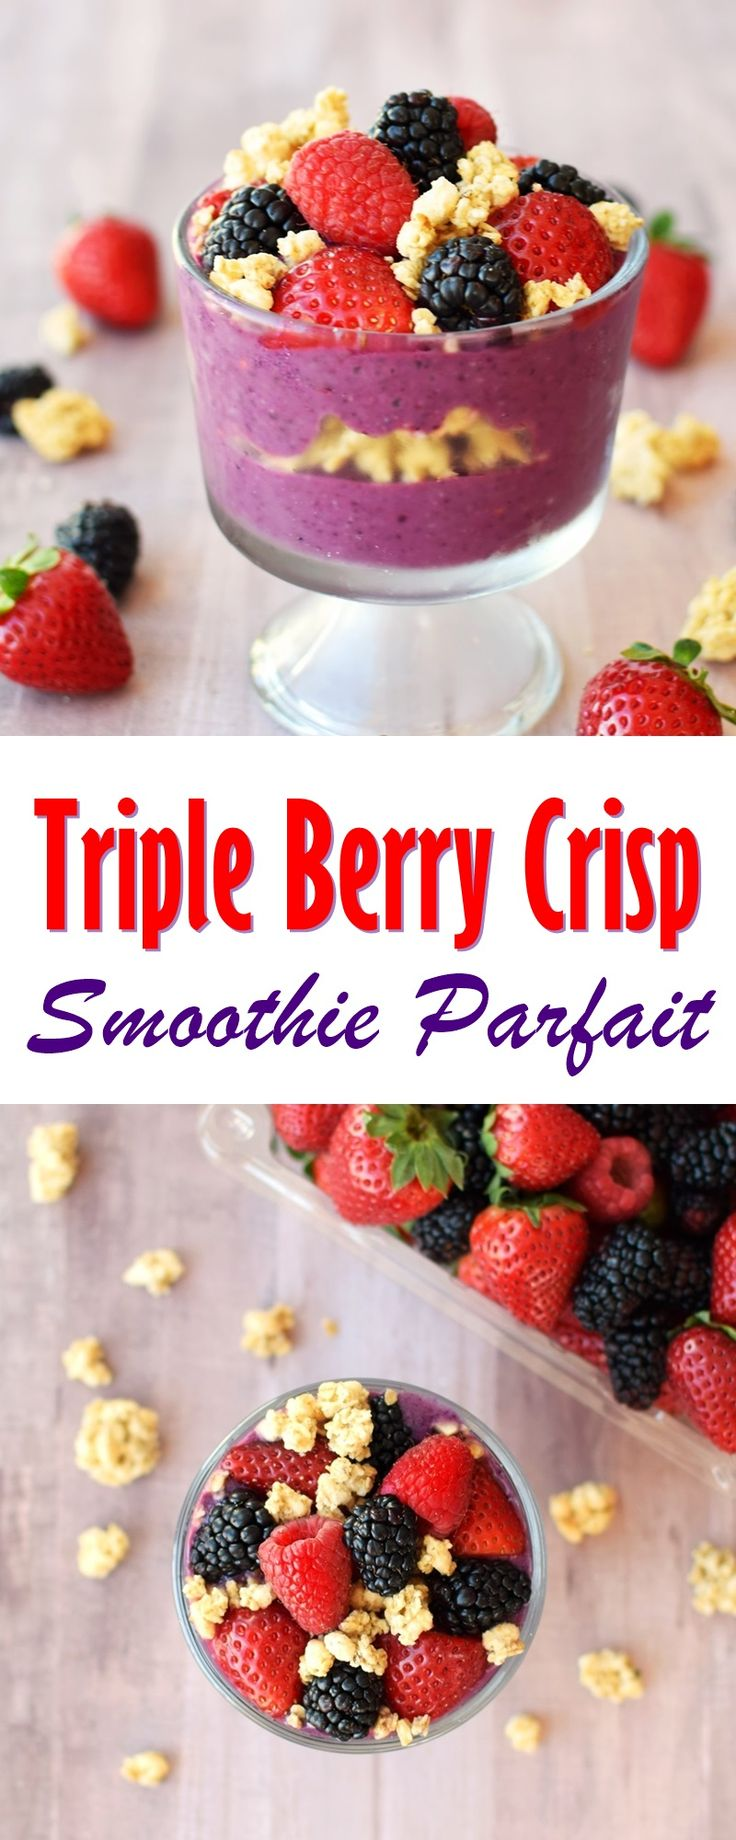 Triple Berry Crisp Smoothie Parfait Recipe - plant-based, dairy-free, single serve @lovemysilk @target #ad